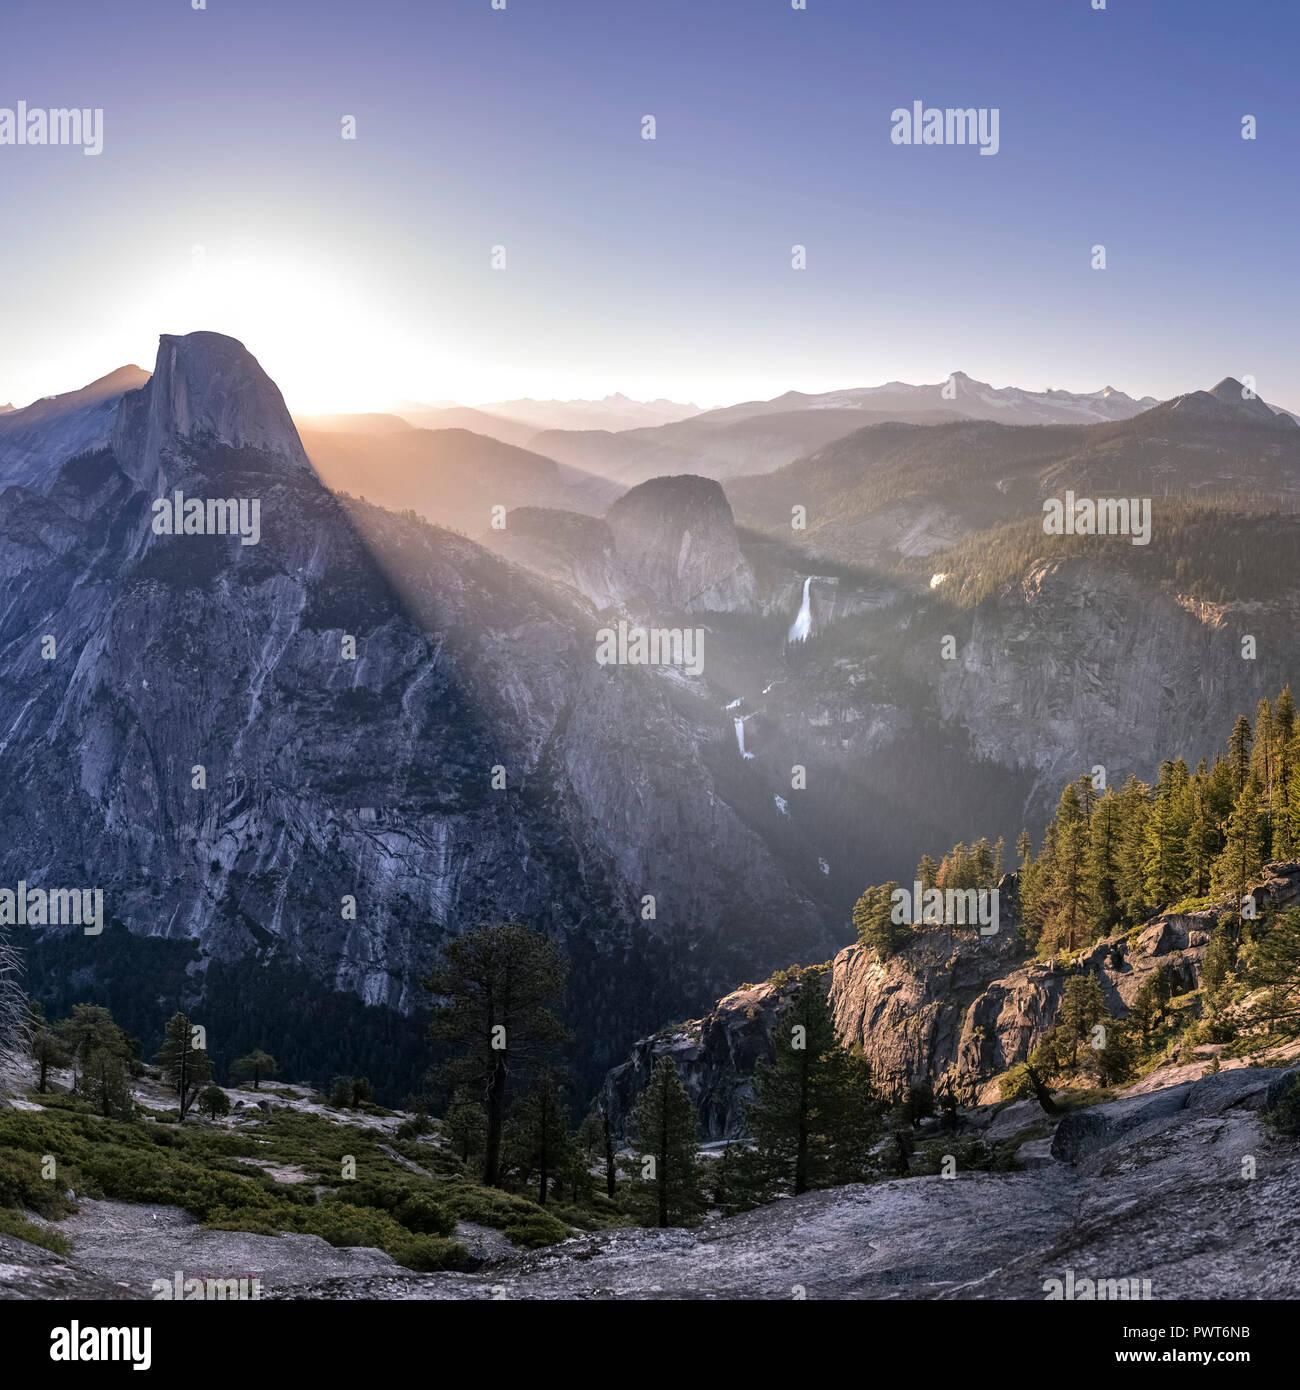 Impressive mountain and Falls at Yosemite CA - Stock Image